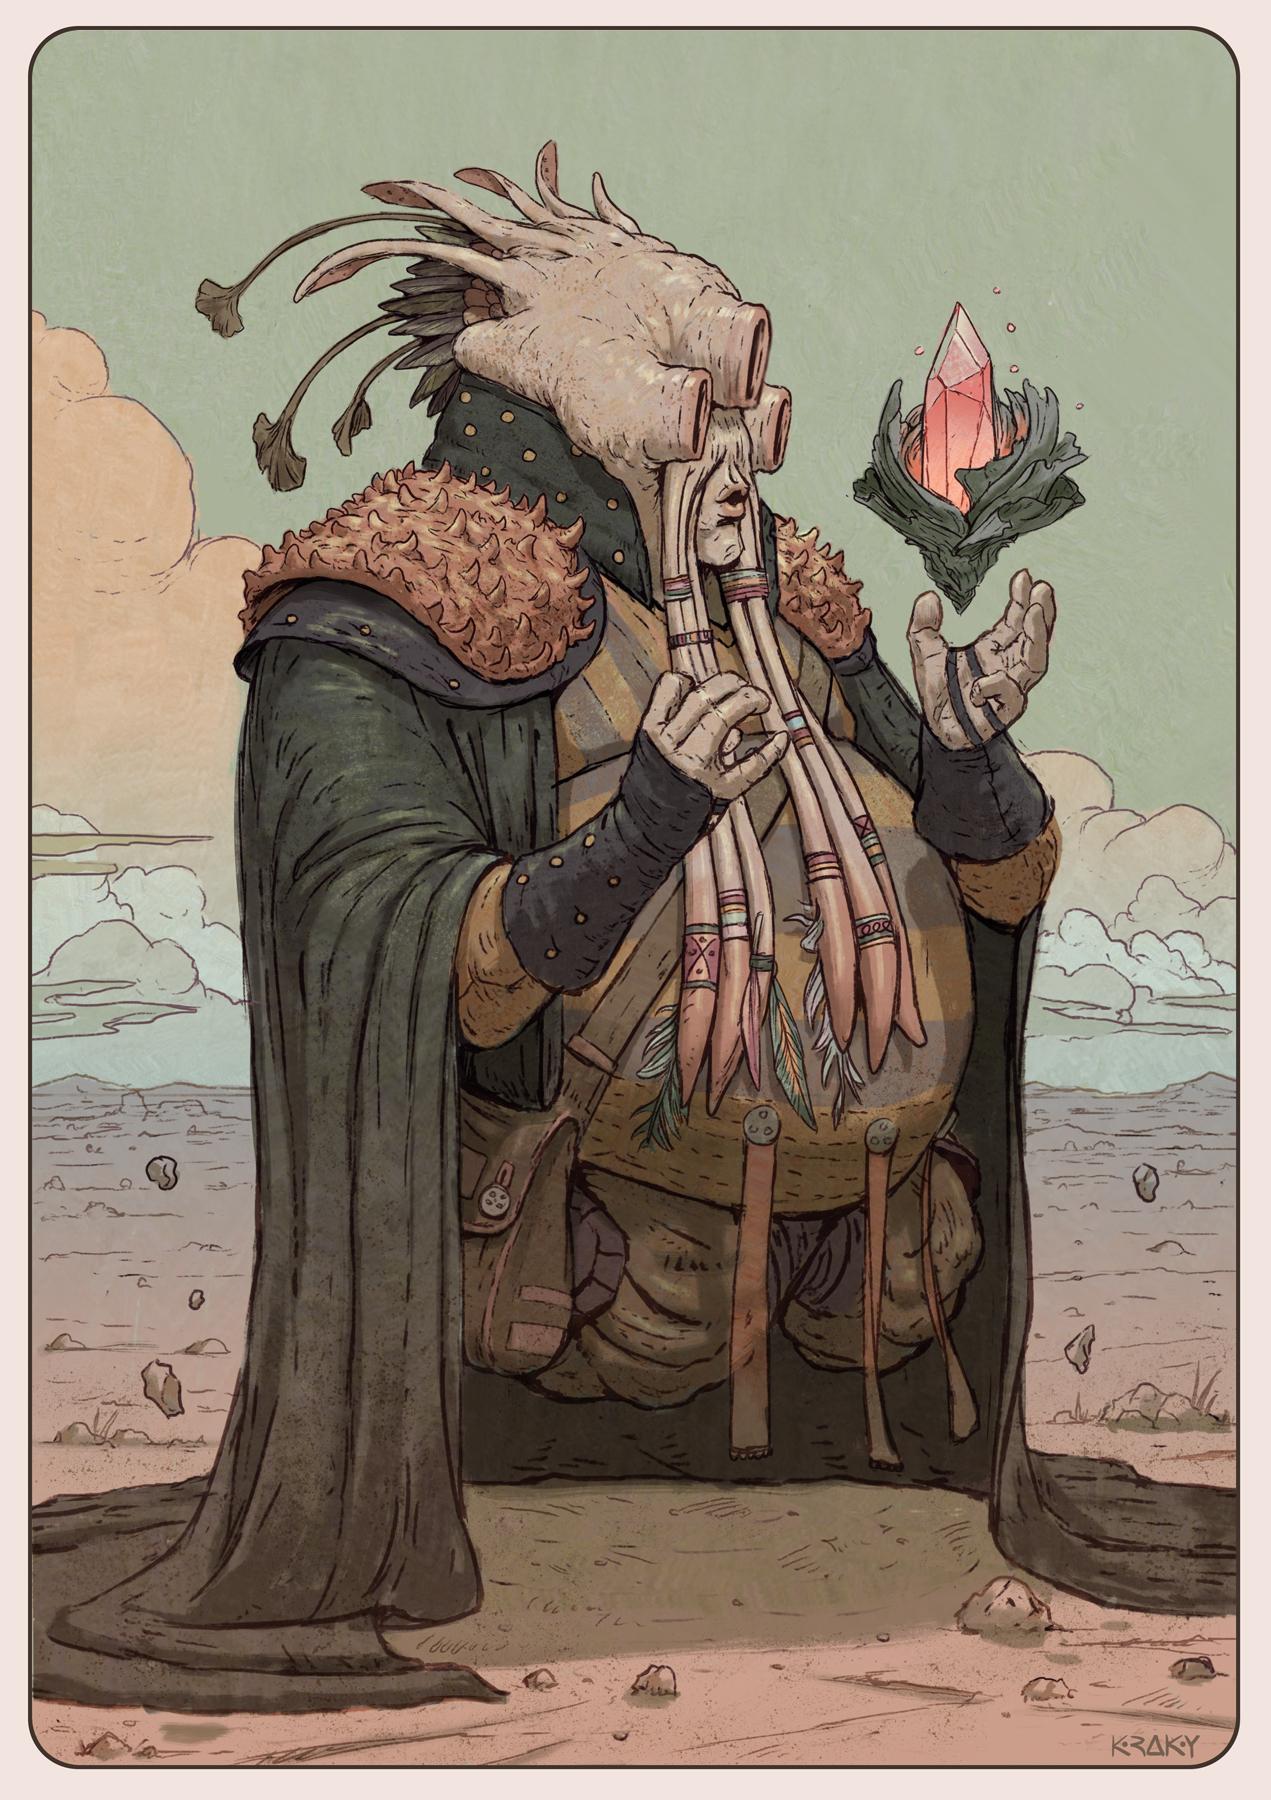 Kraky shaman of ancient ma 1 62f44ab0 vzhn